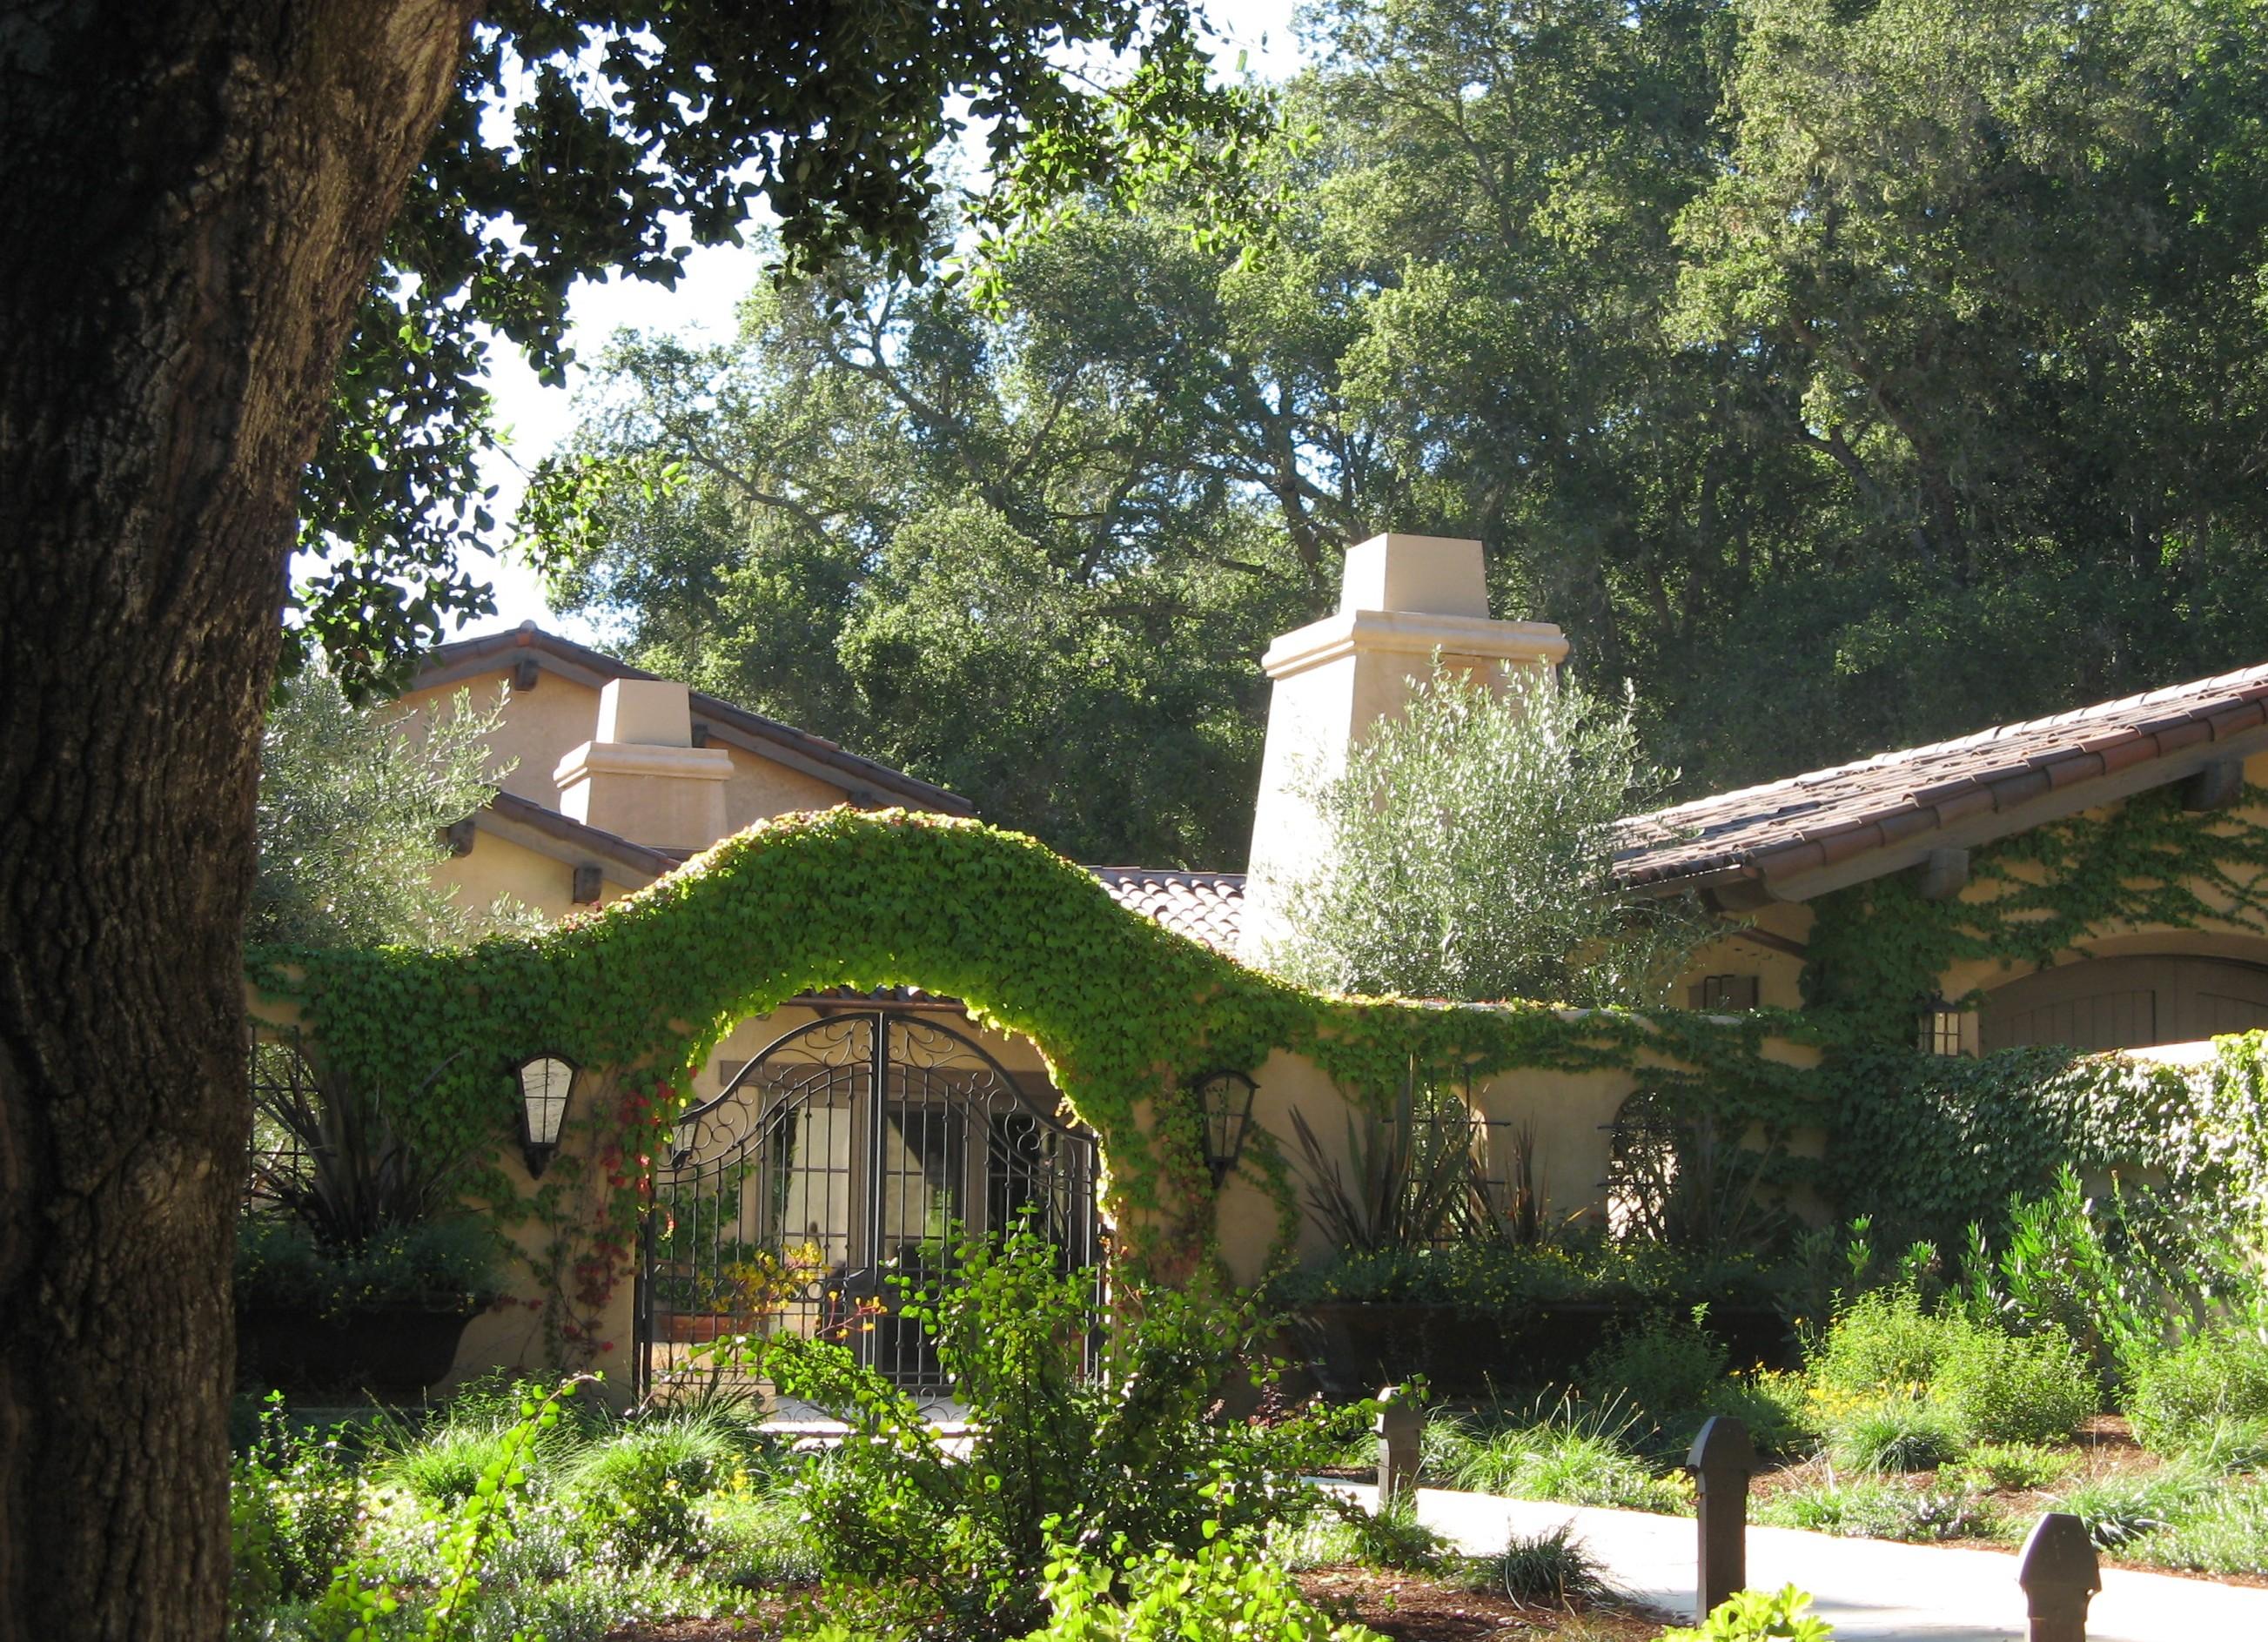 Santa Lucia Preserve - Carmel, CA - Lot 47